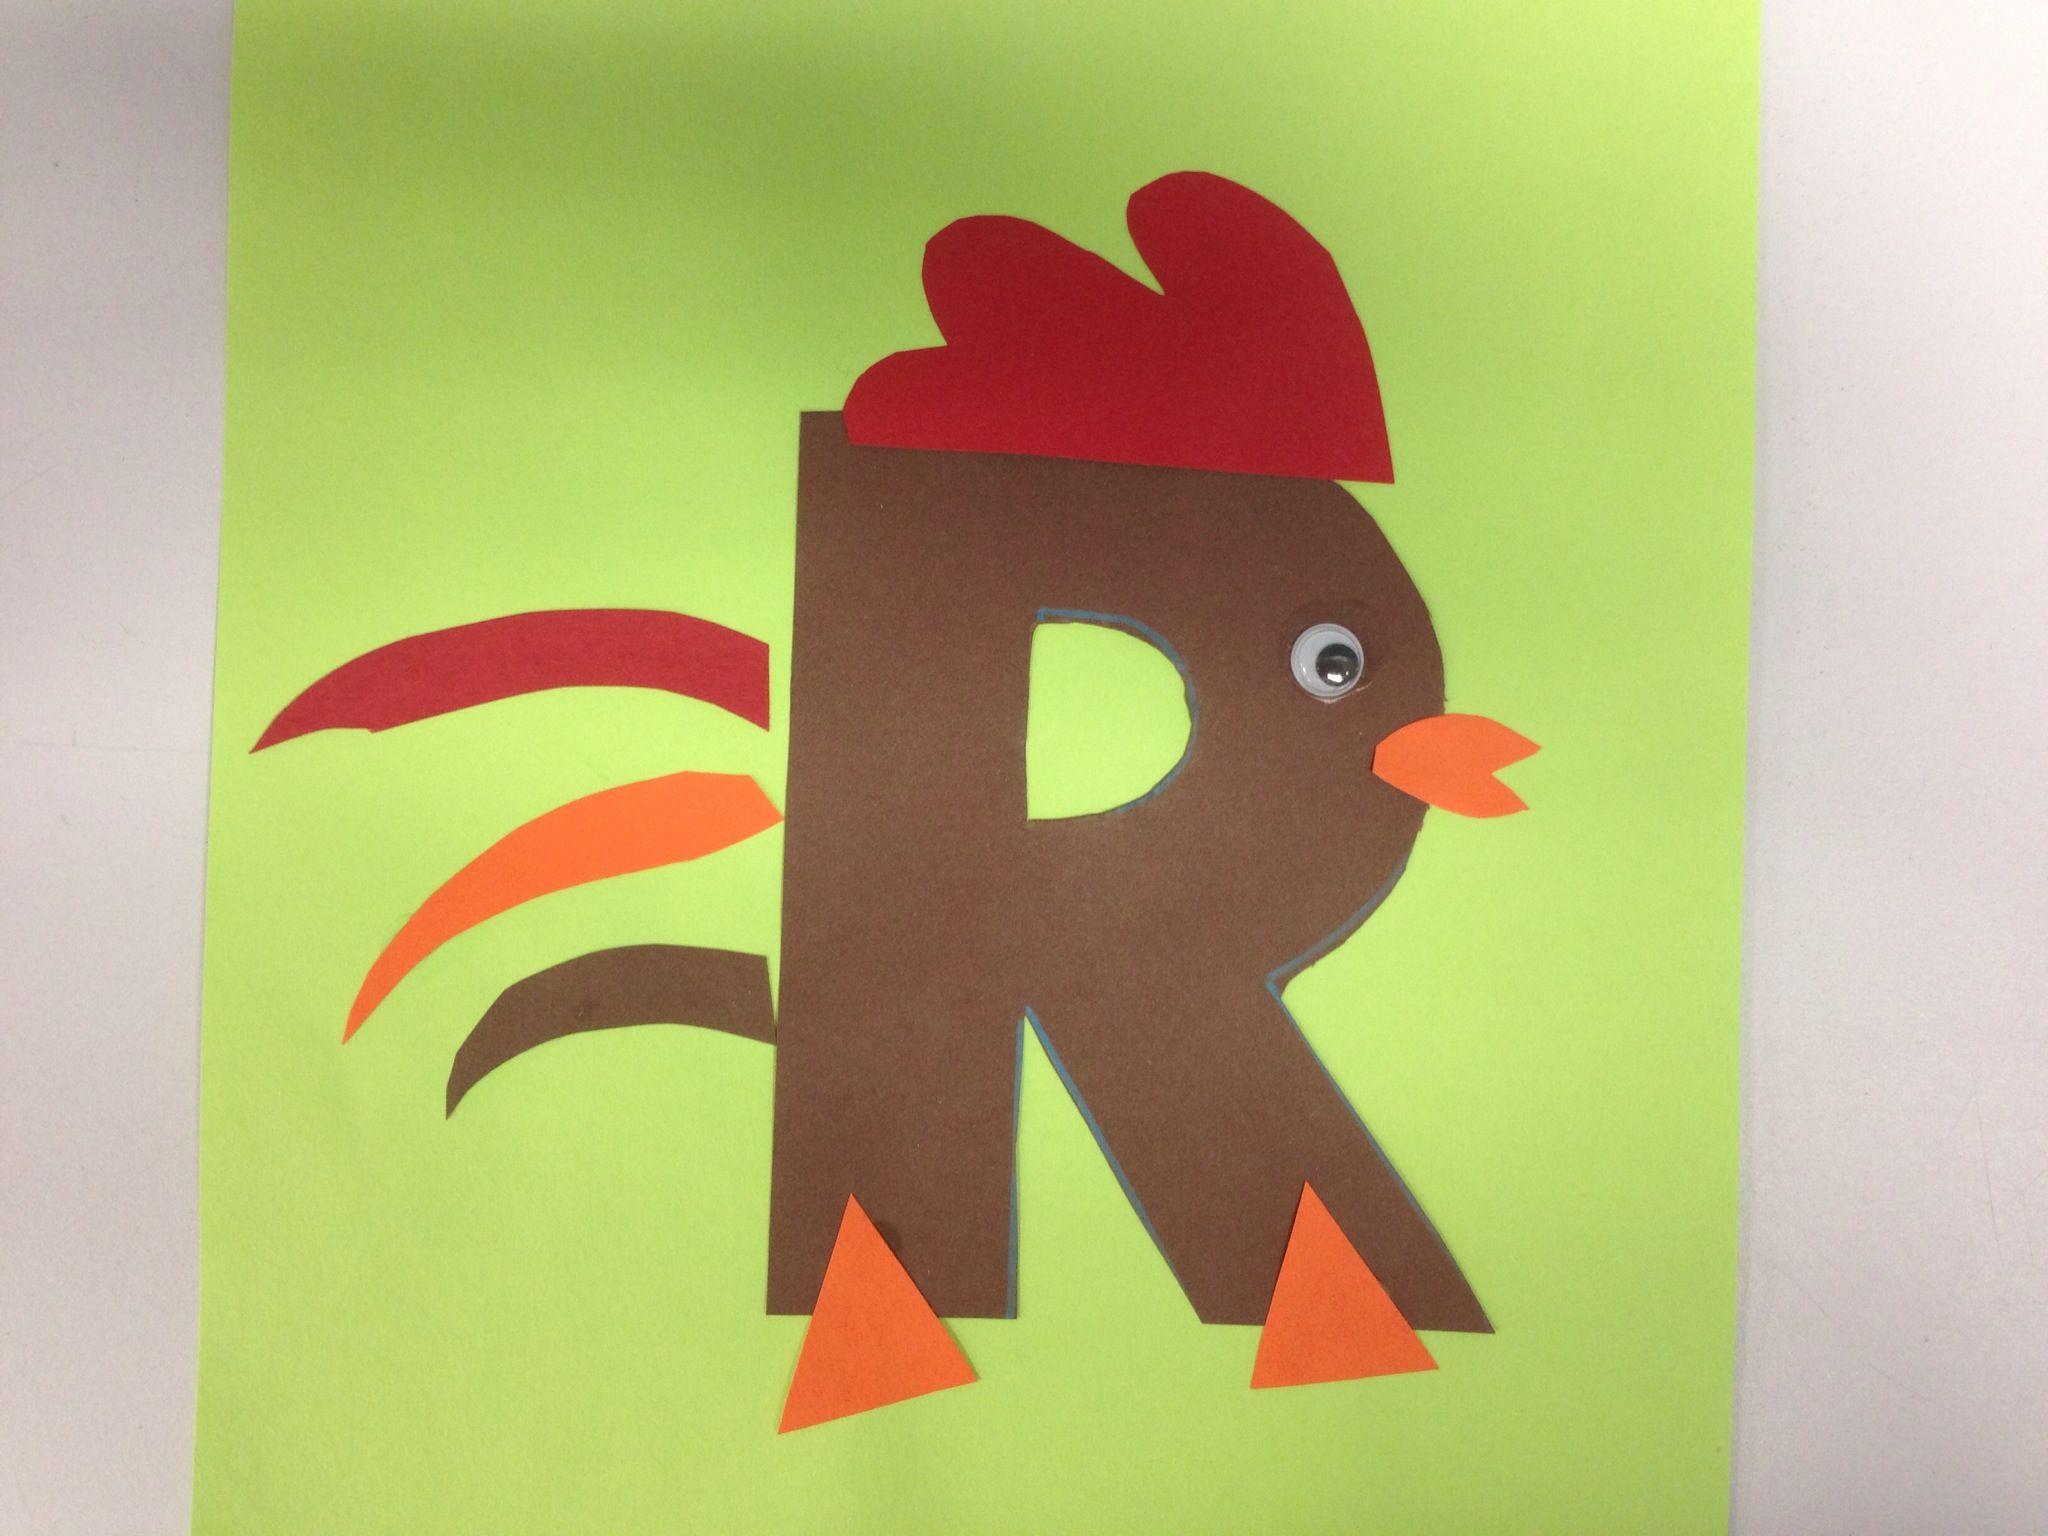 Letter R Crafts For Preschoolers